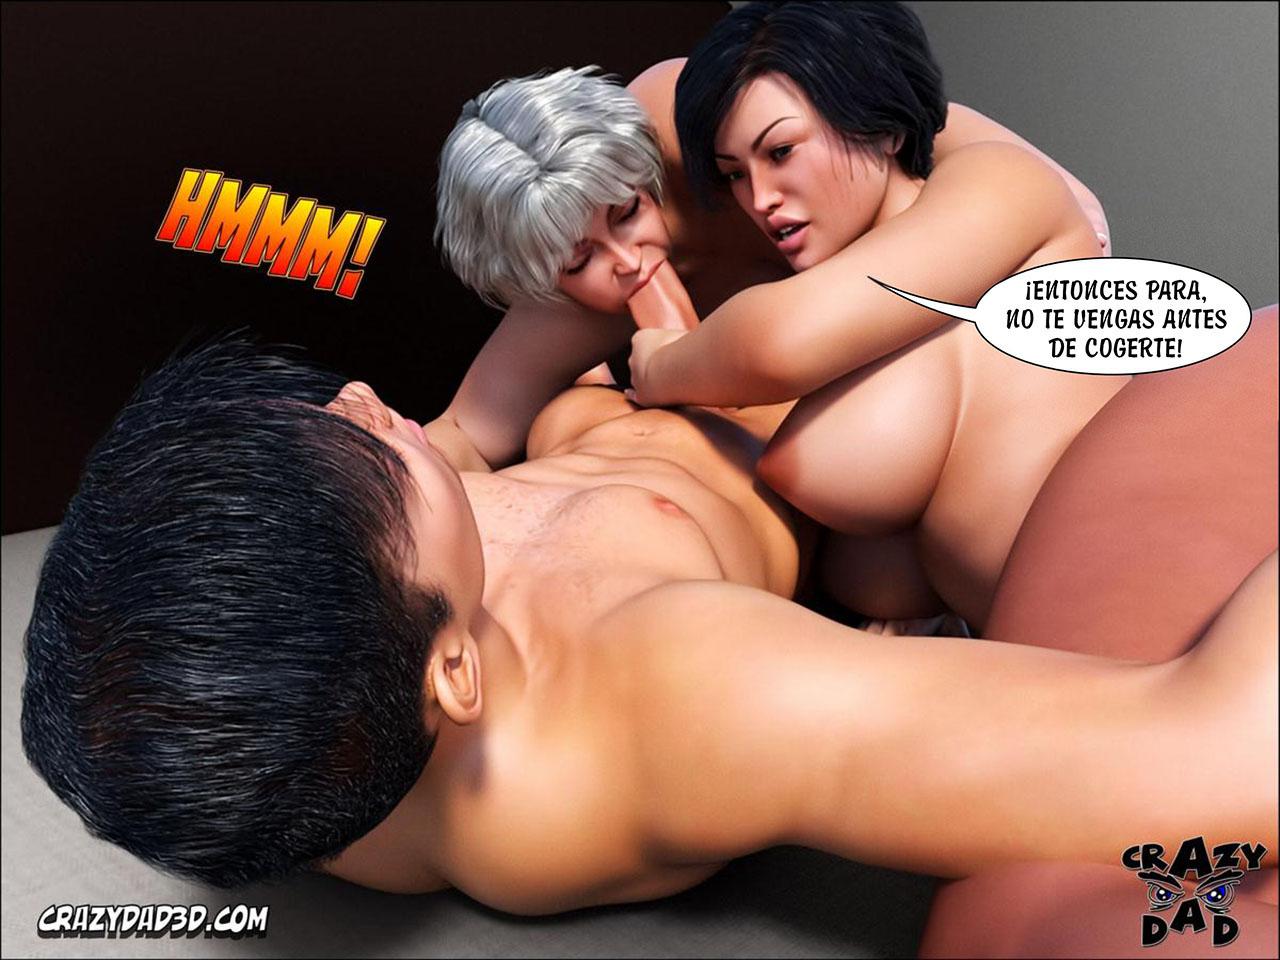 MOTHER DESIRE Forbidden parte 8